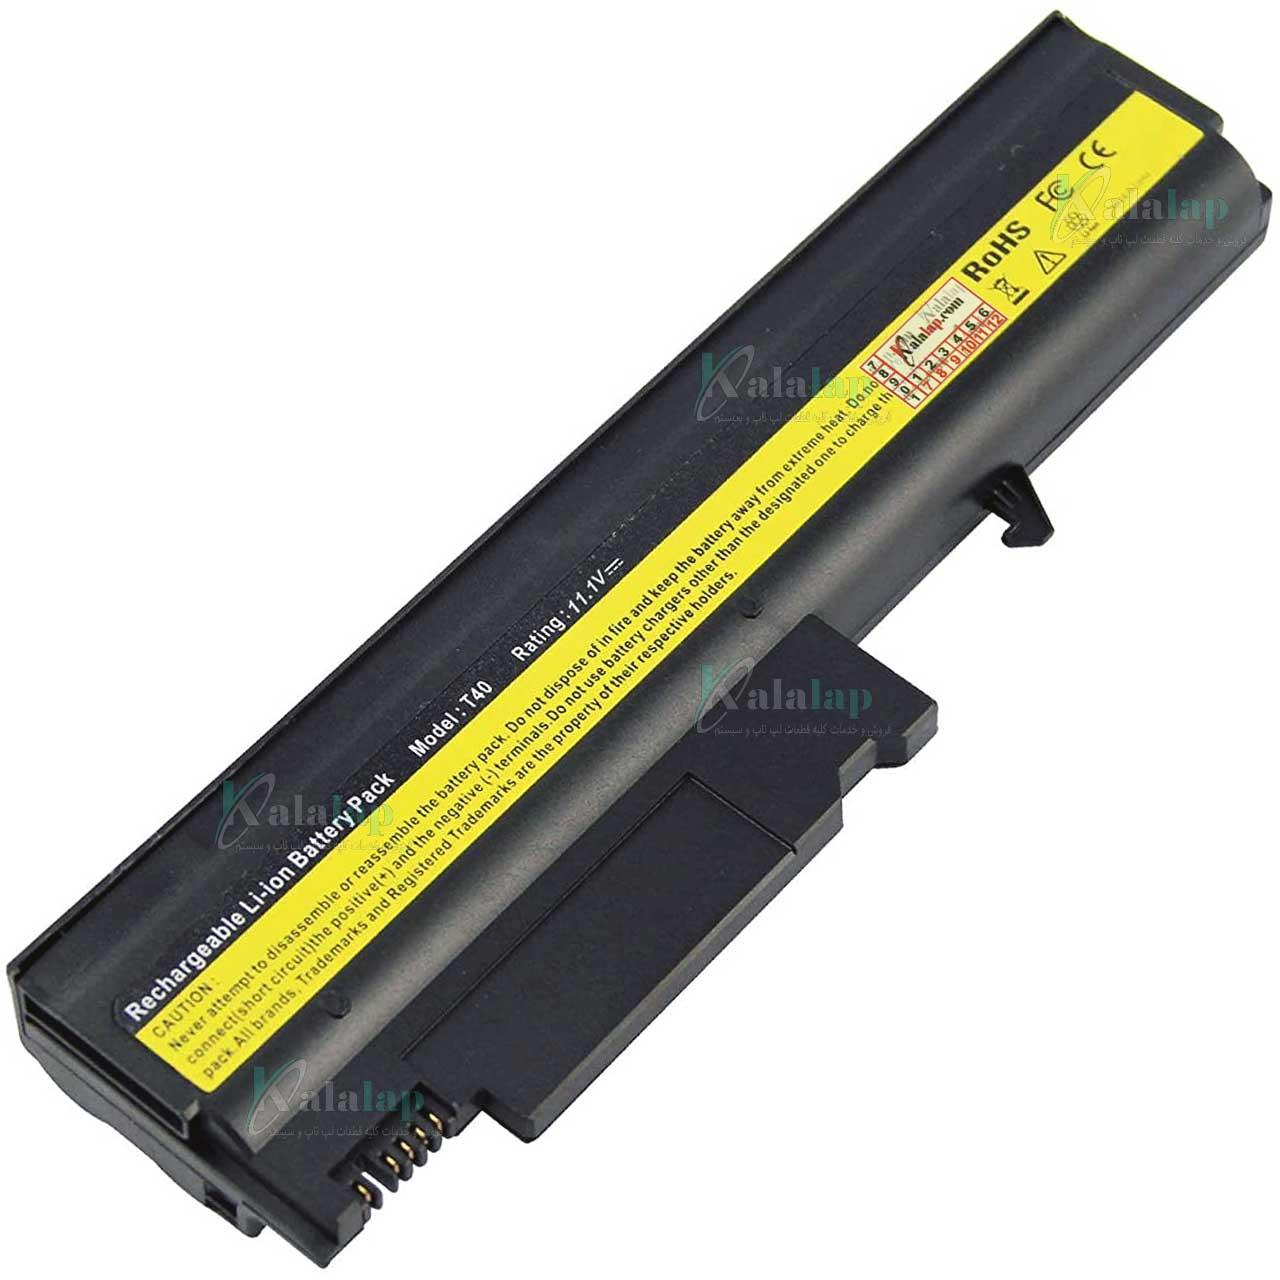 باتری لپ تاپ لنوو Battery Laptop Lenovo ThinkPad T40